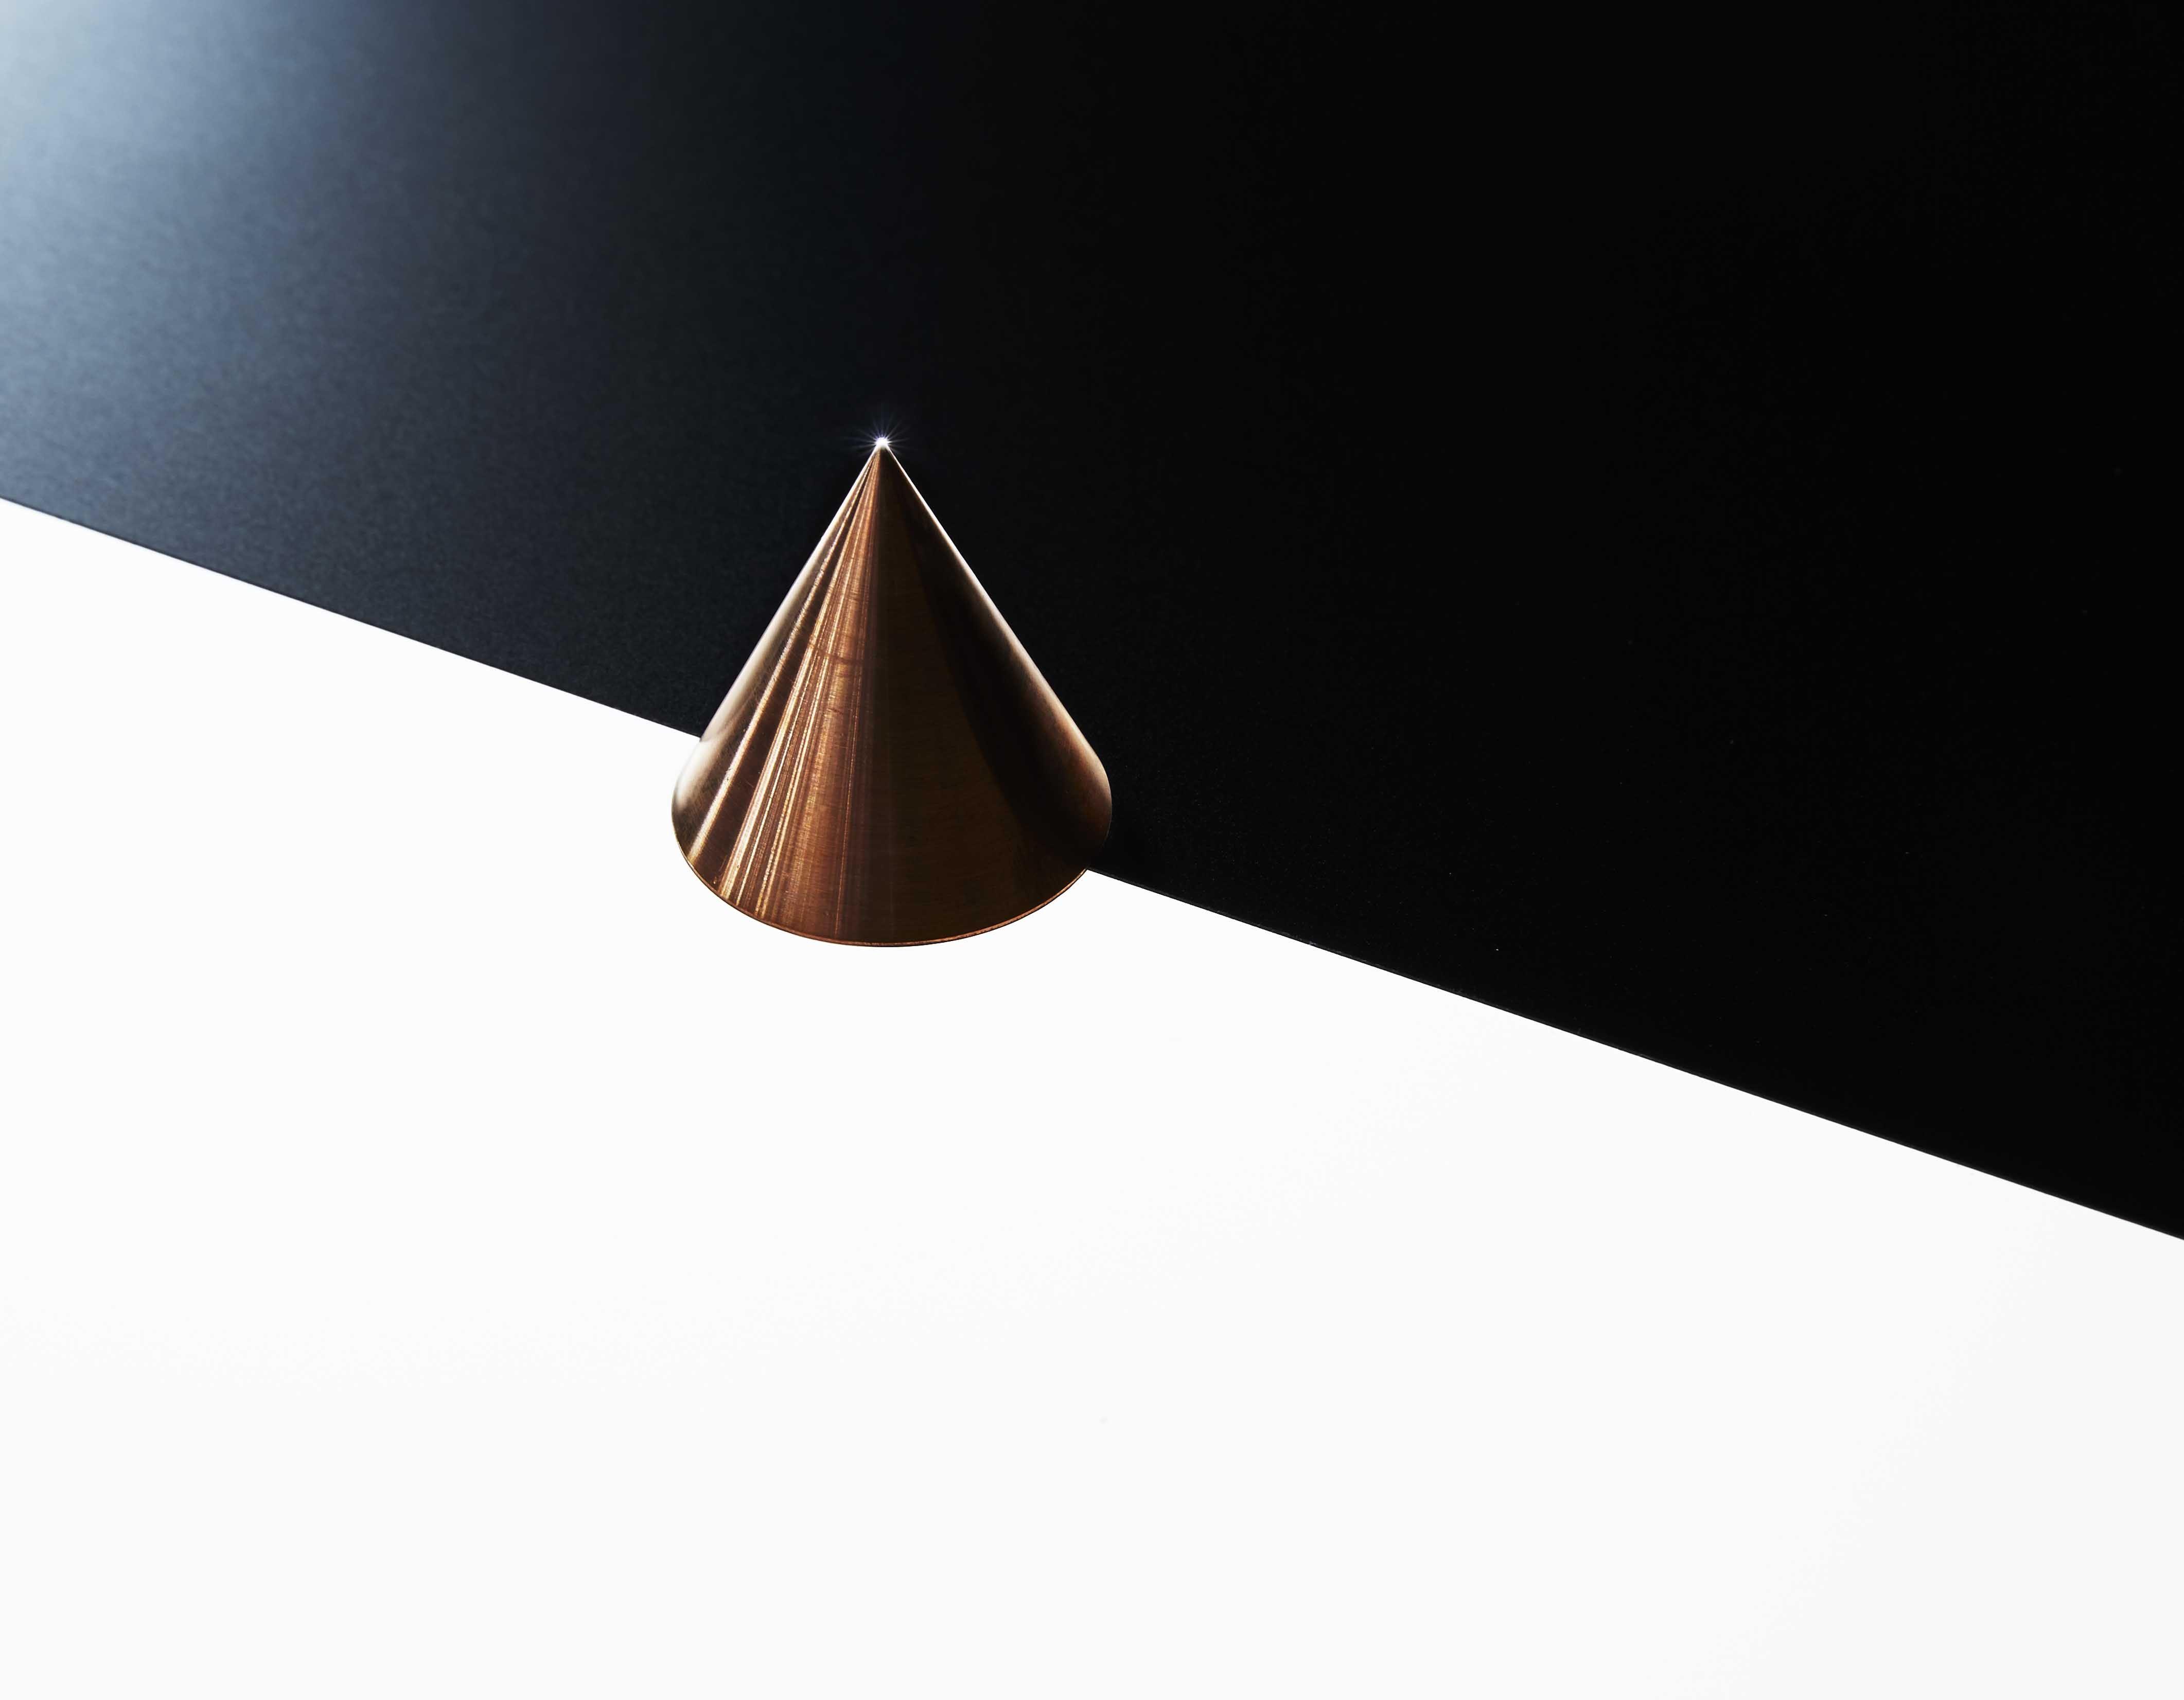 Yuki Kawakamiの作品